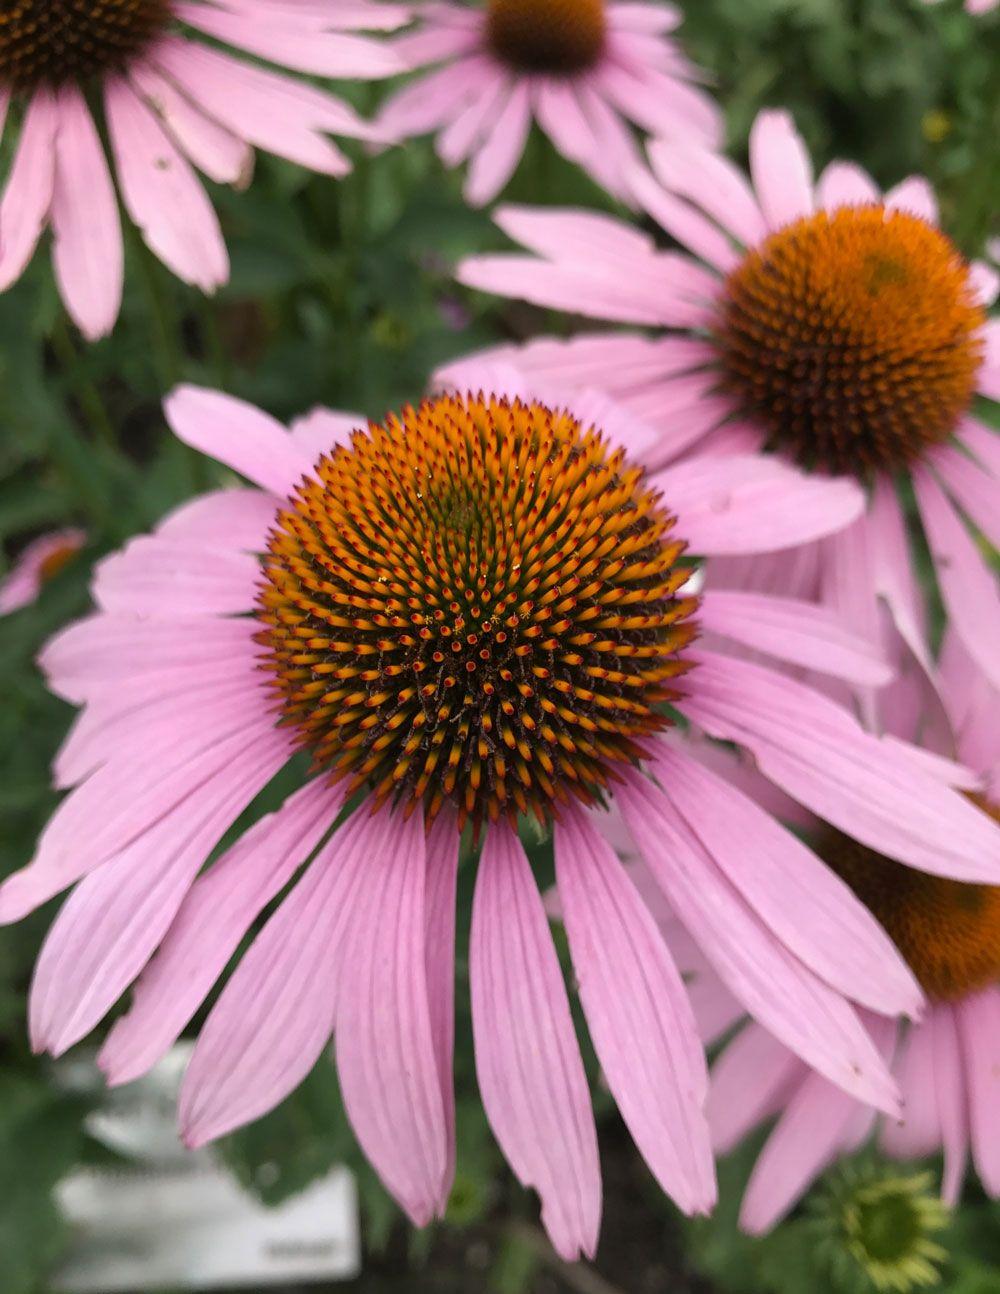 Echinacea! Gartenträume werden wahr  Naturpark Hofanger in Gstadt entdeckt!